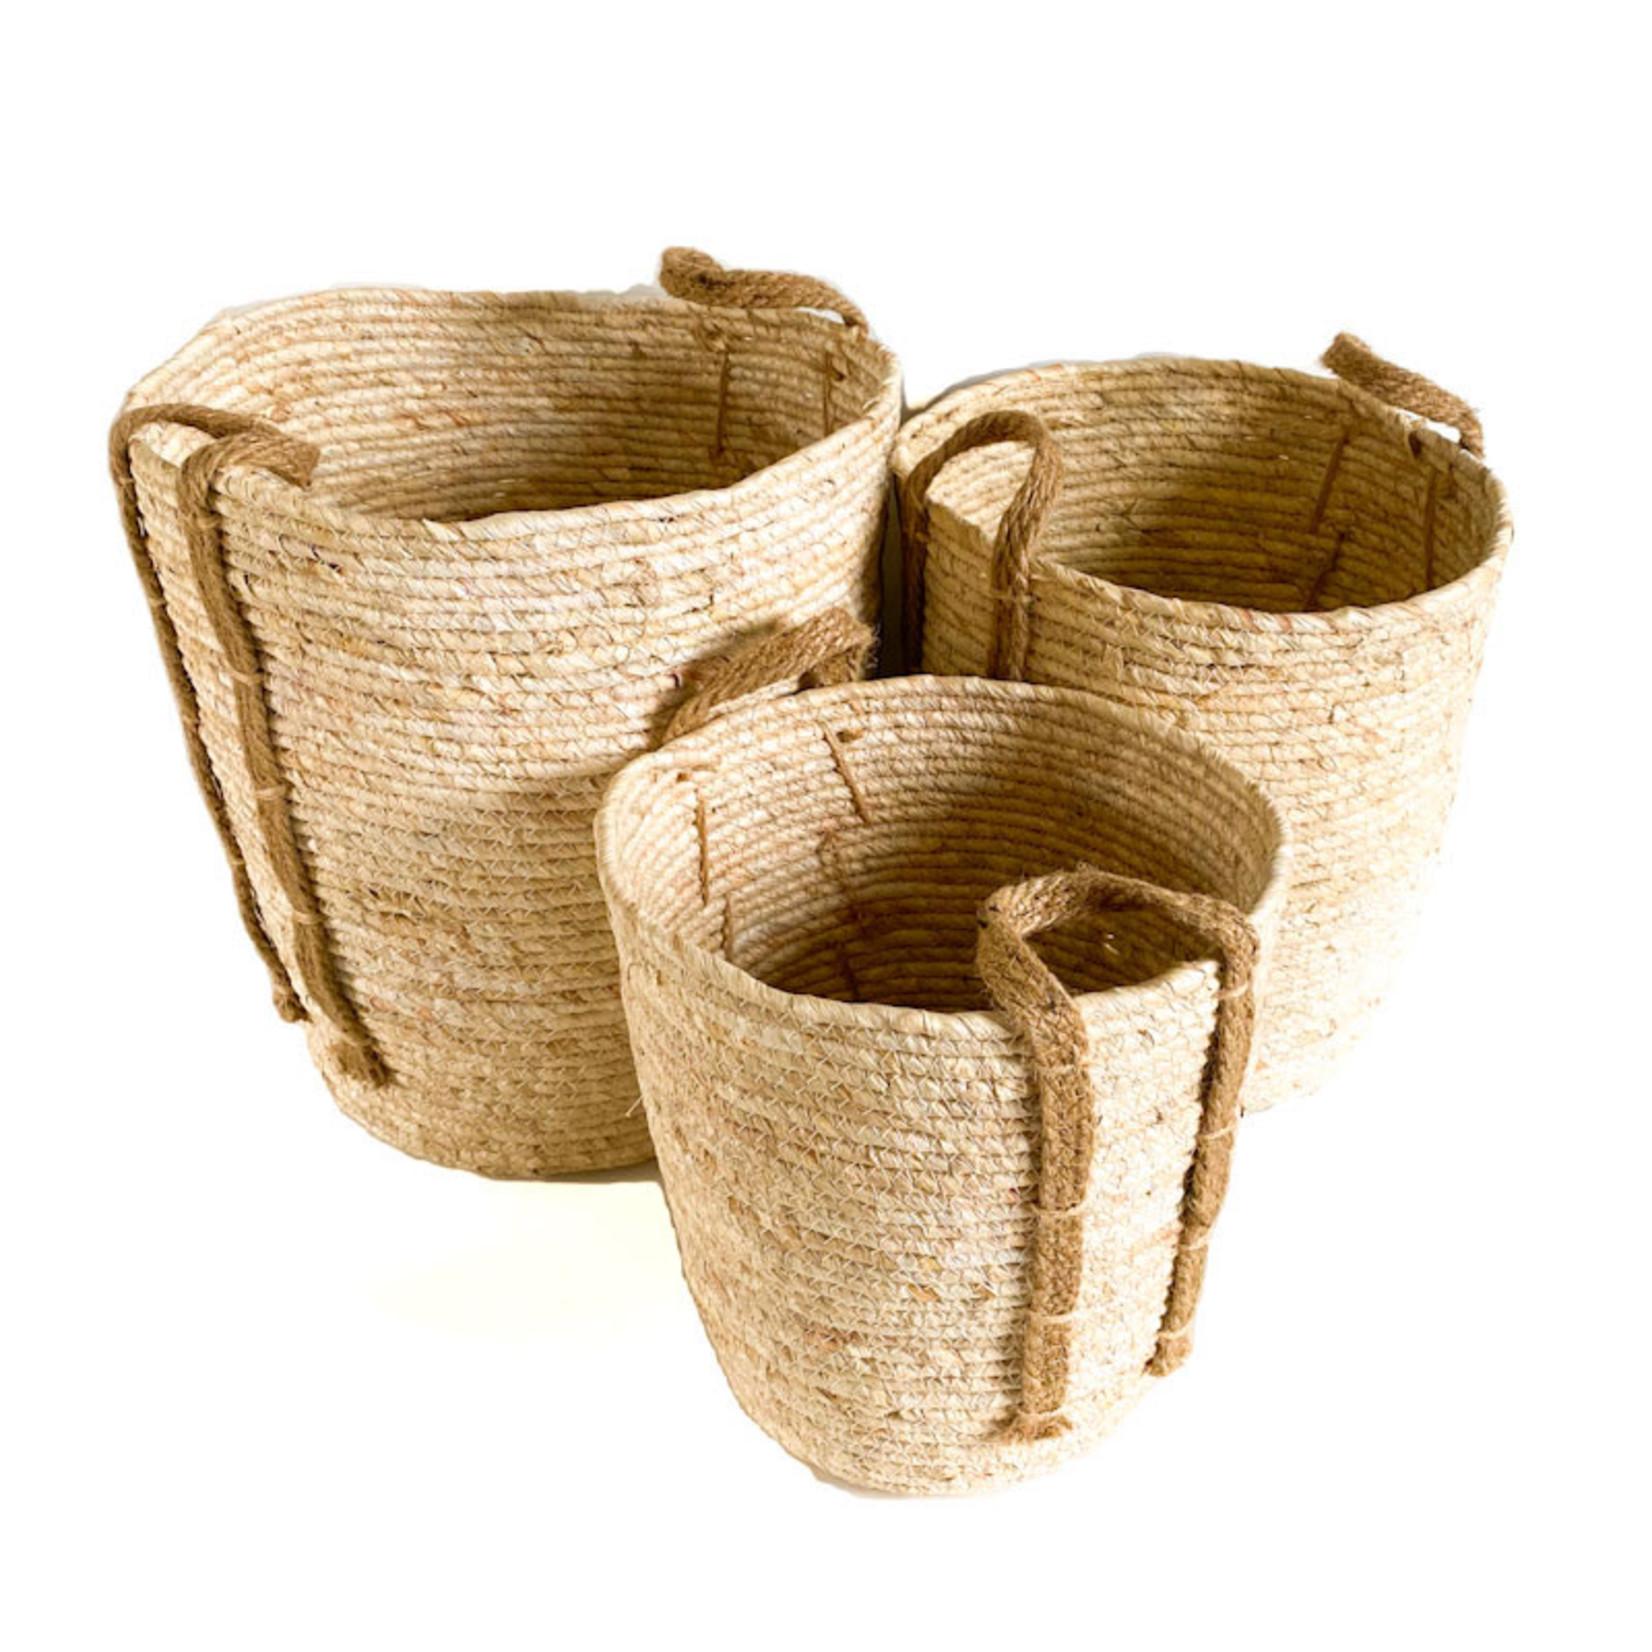 Jute Basket - cream